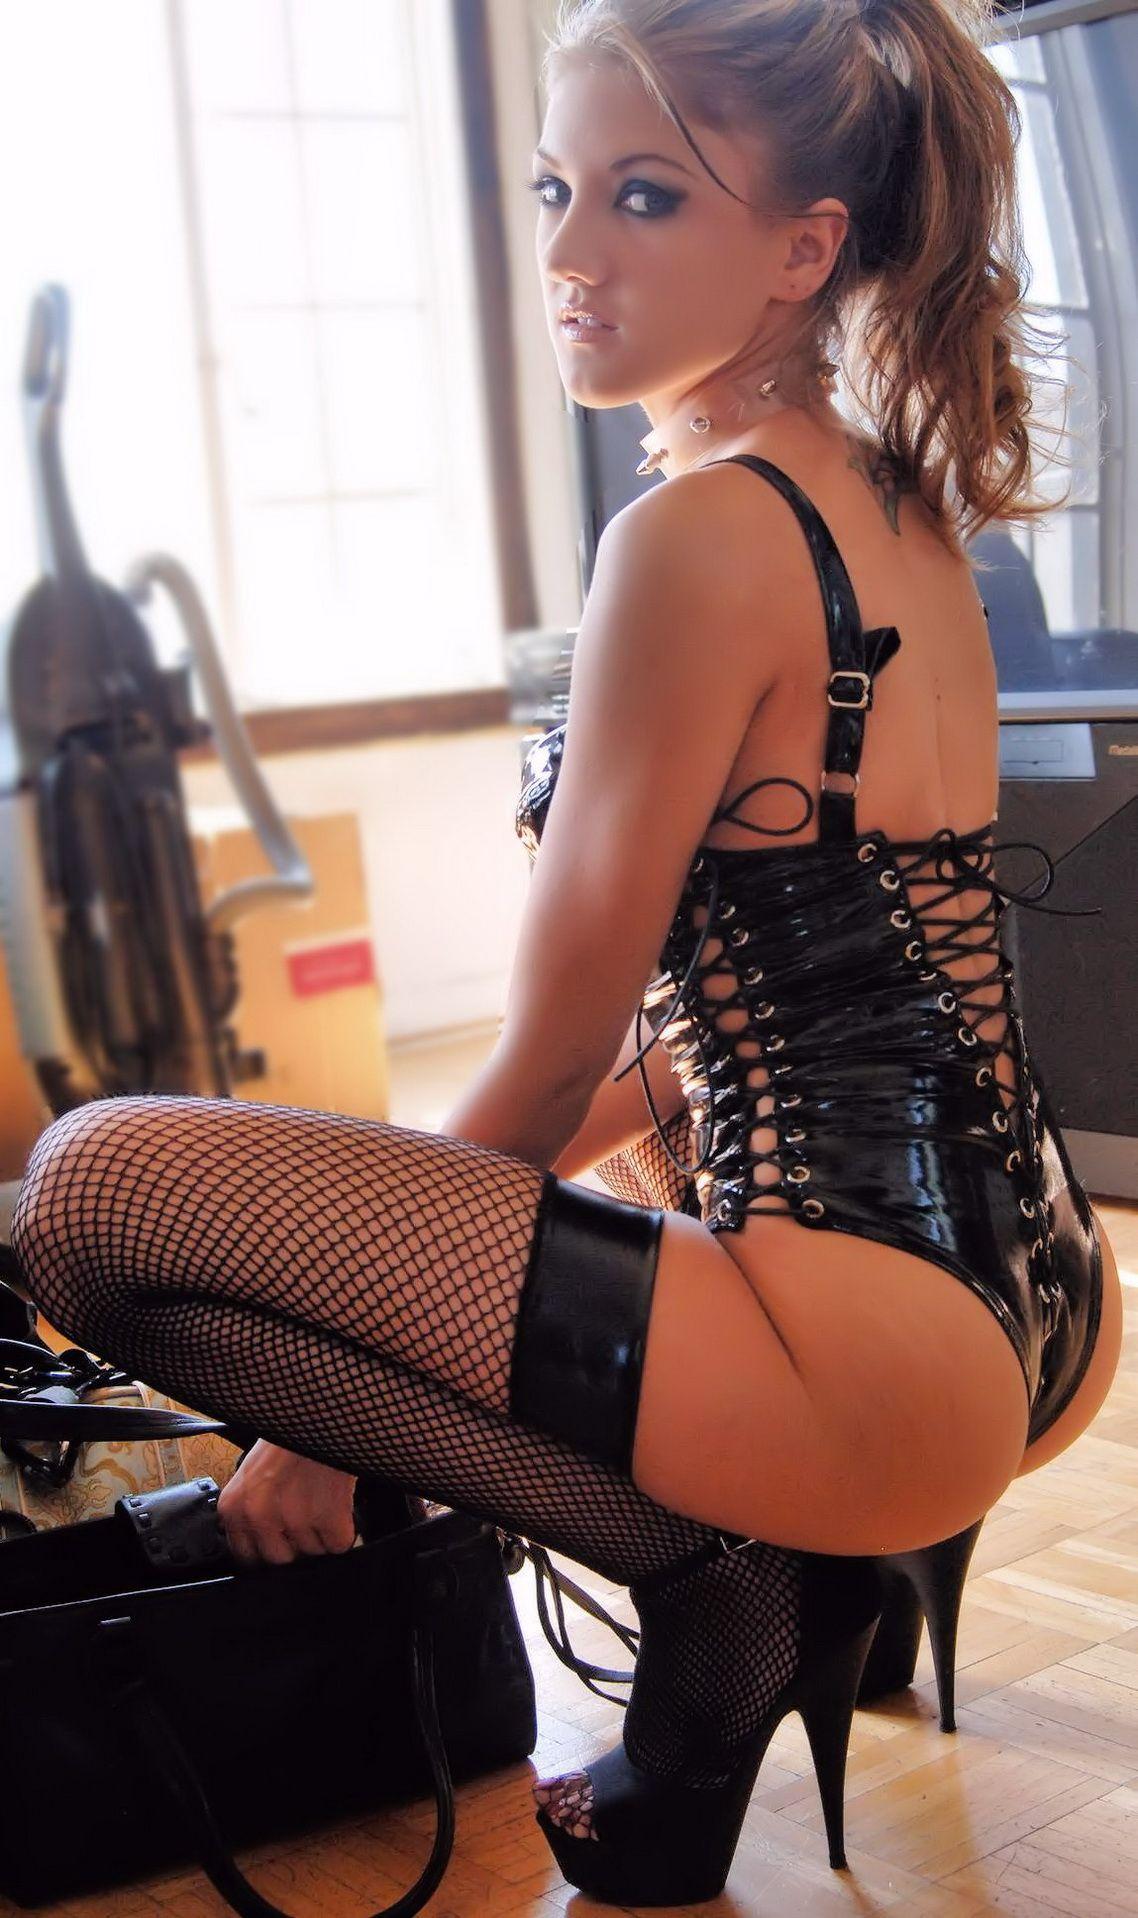 extreme anal sex escort girl sweden